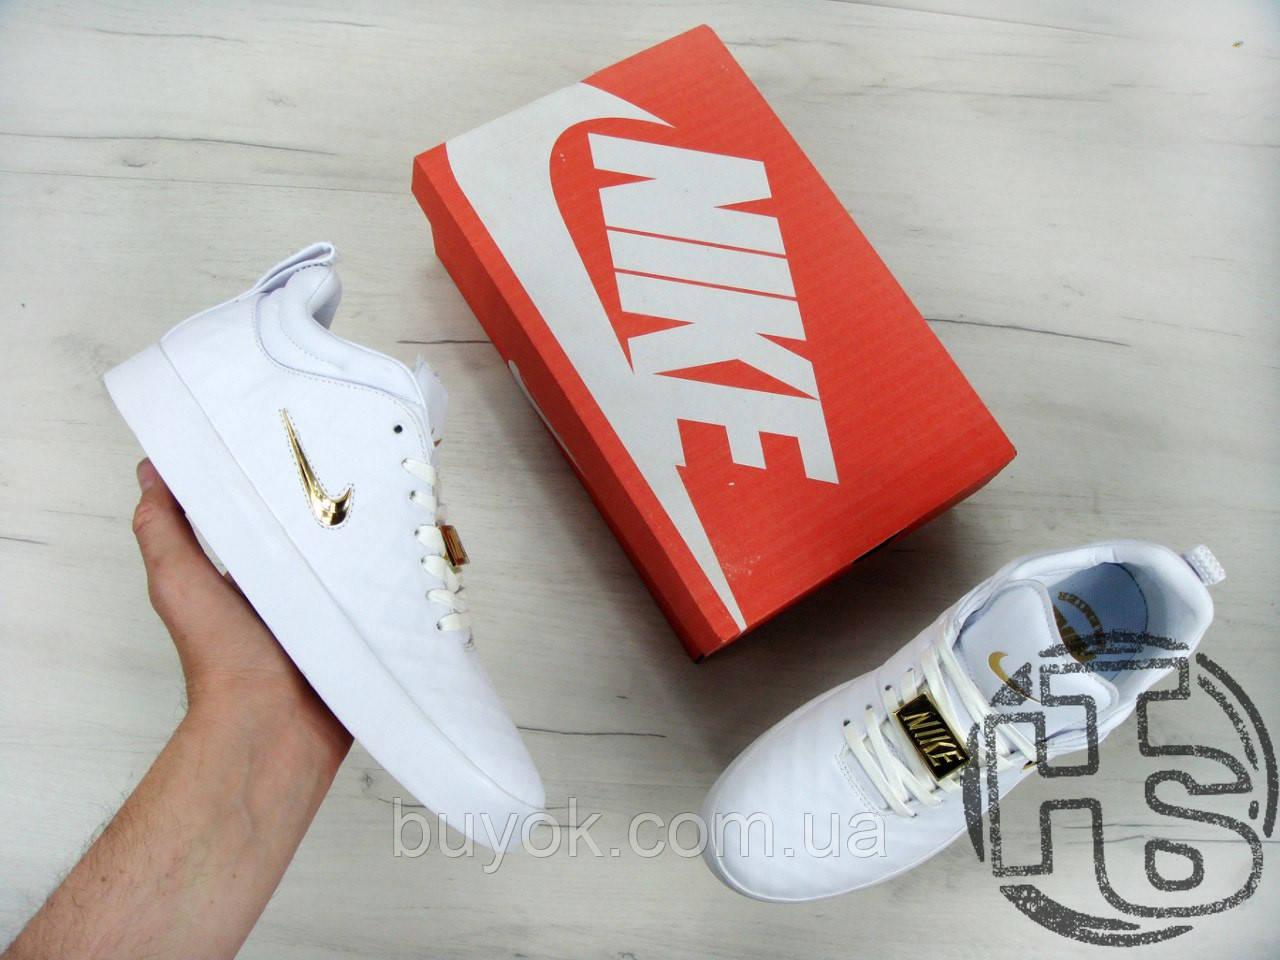 Чоловічі кросівки Nike Tiempo Vetta 17 Beige/Gold/White 876245-100